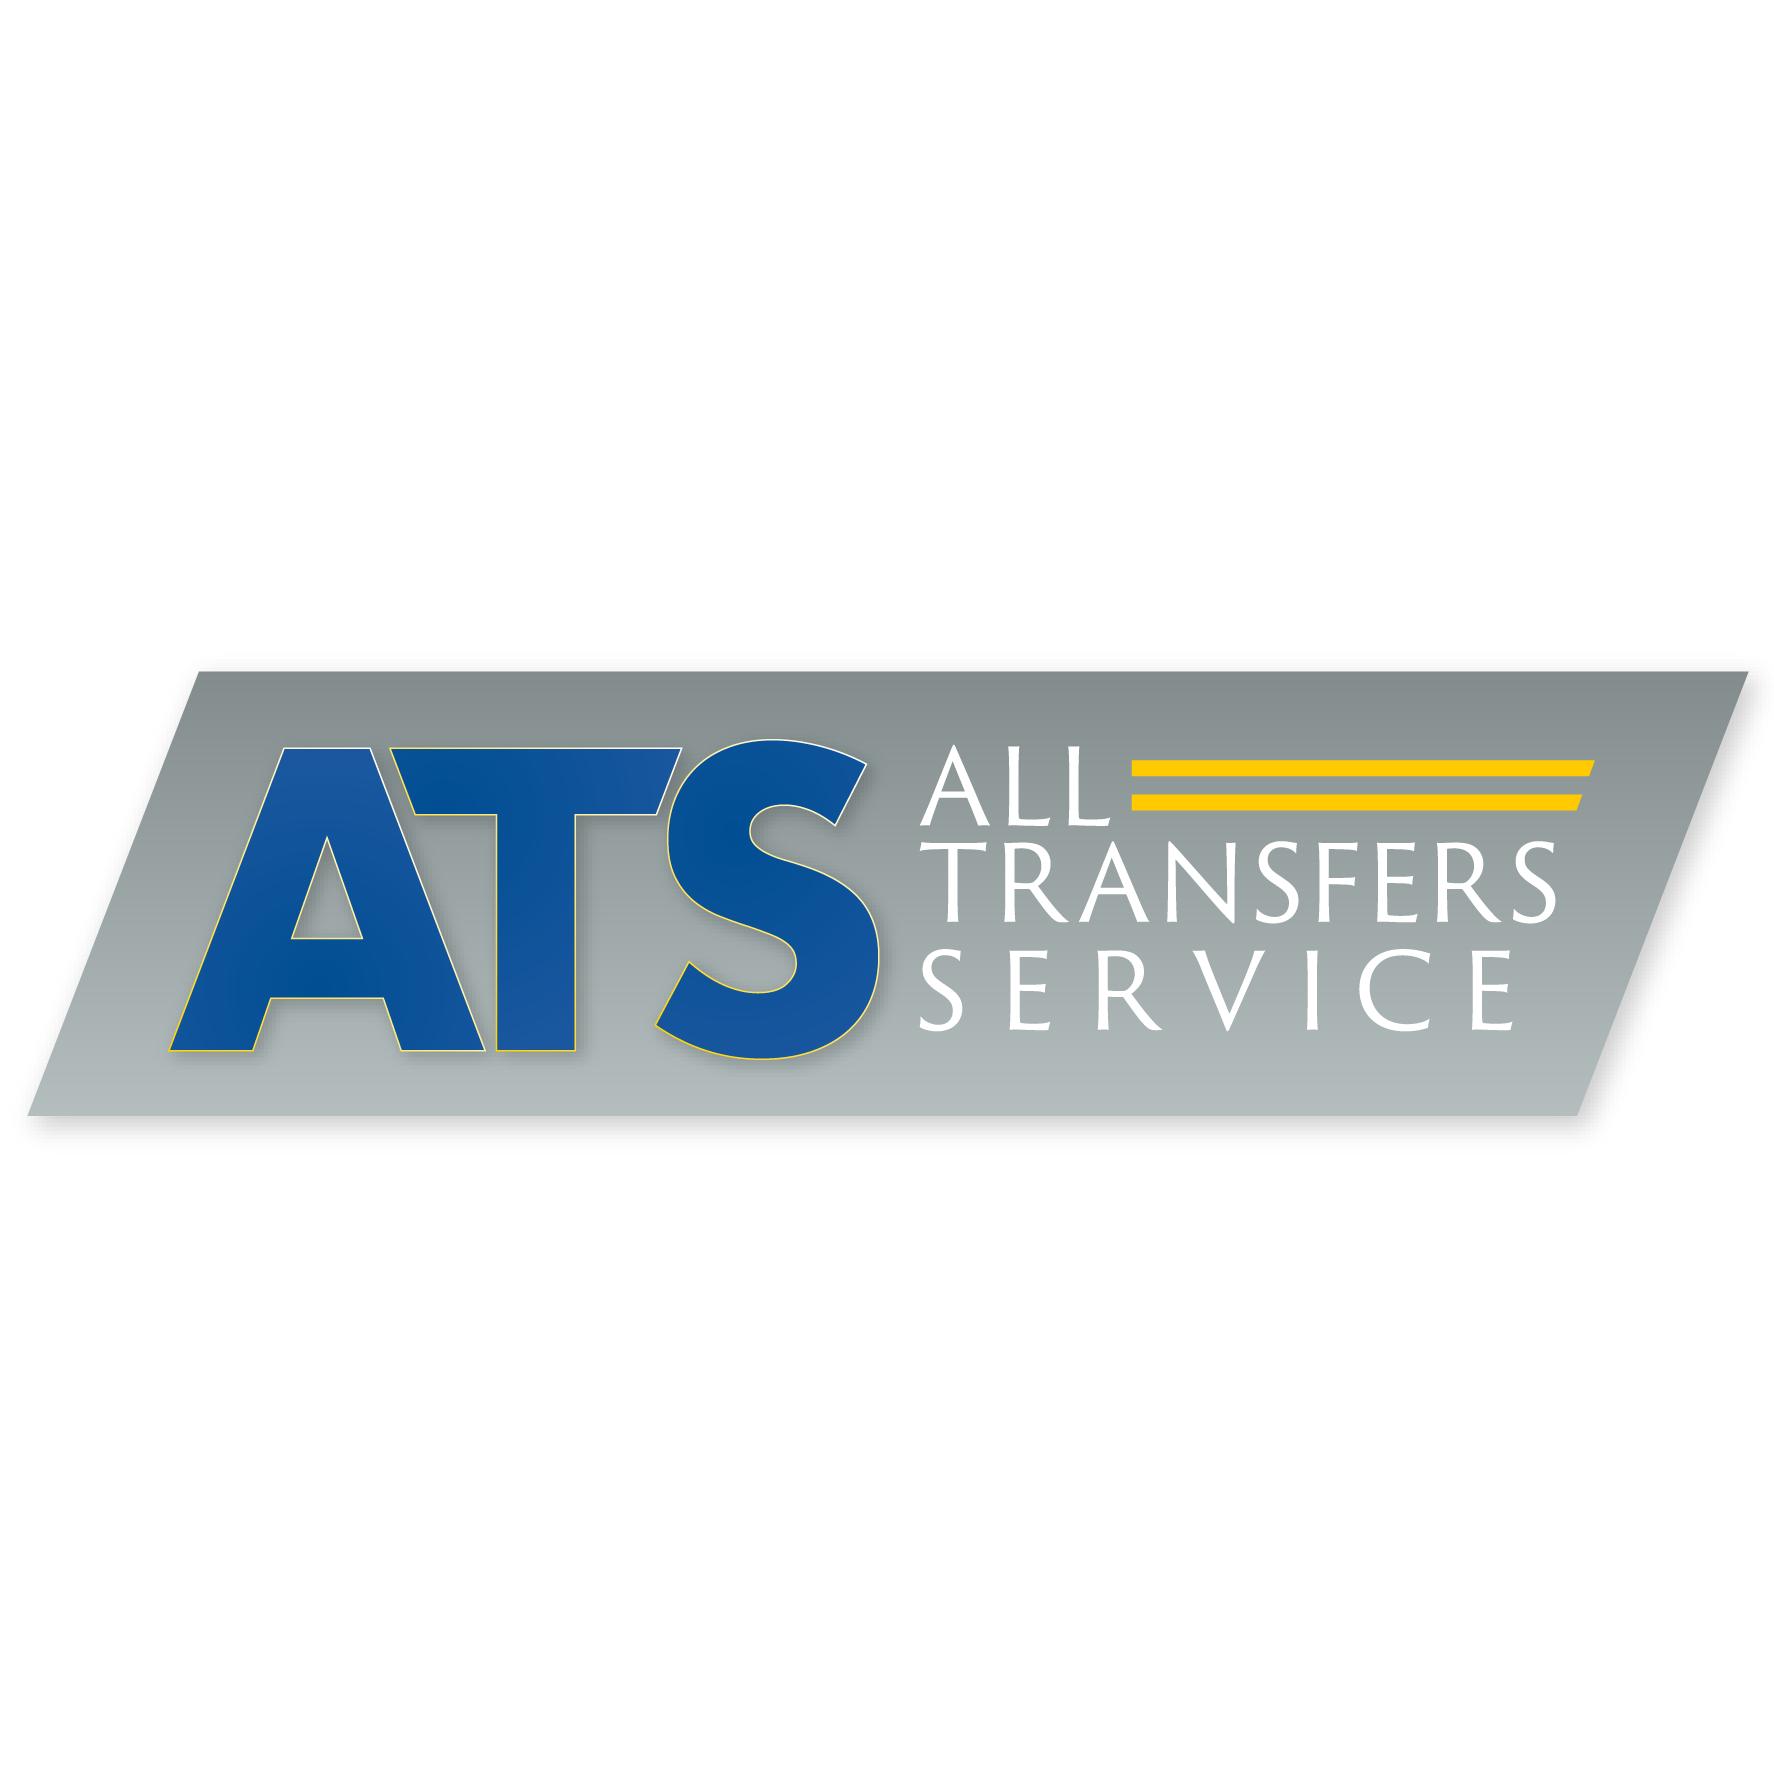 All Transfers